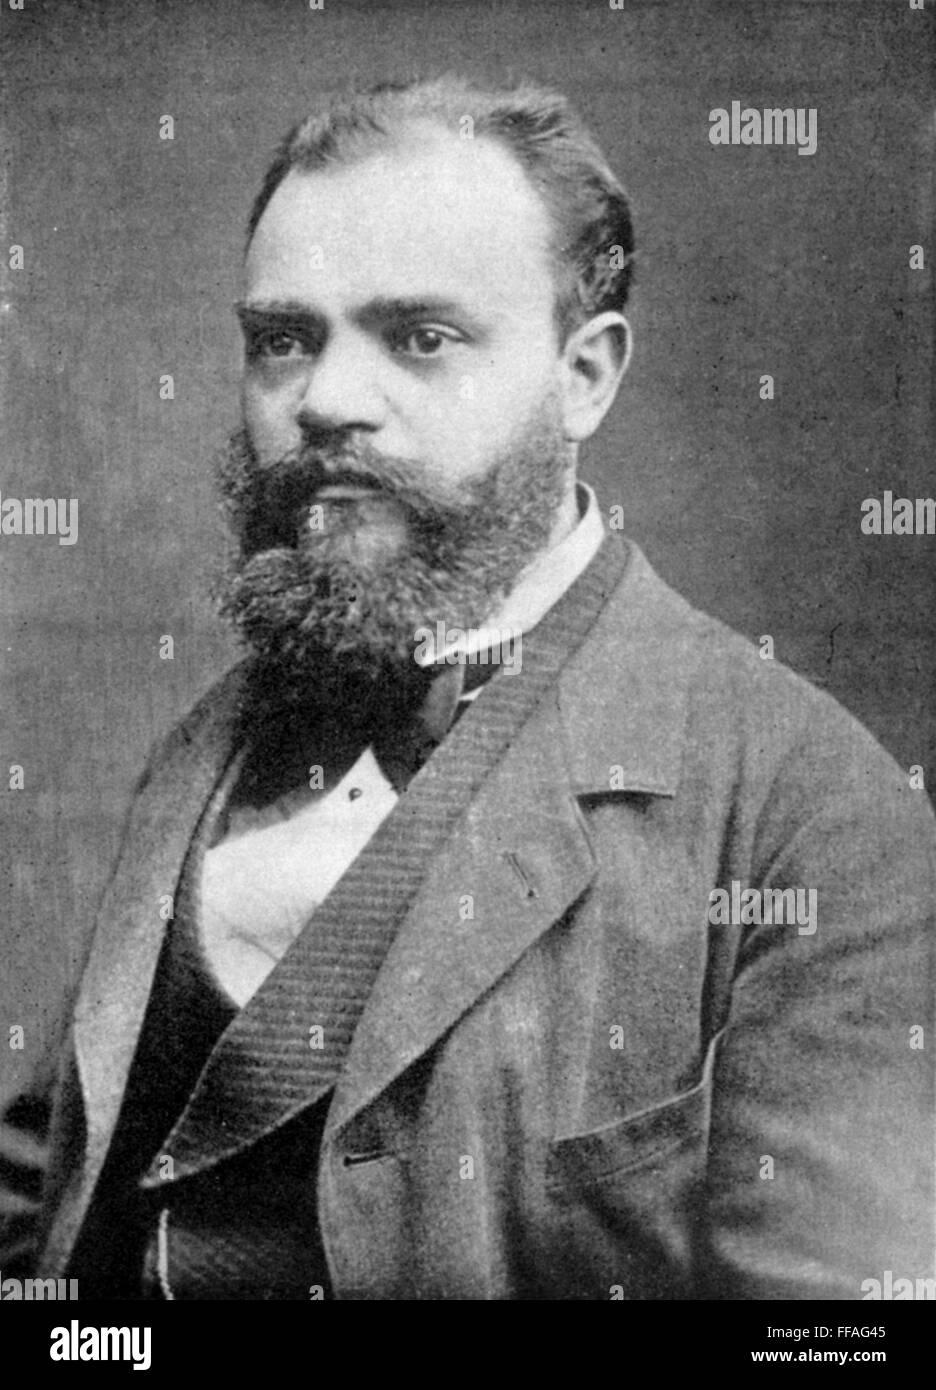 Antonin dvorak 1841 1904 nczech composer stock photo for Mobel dvorak